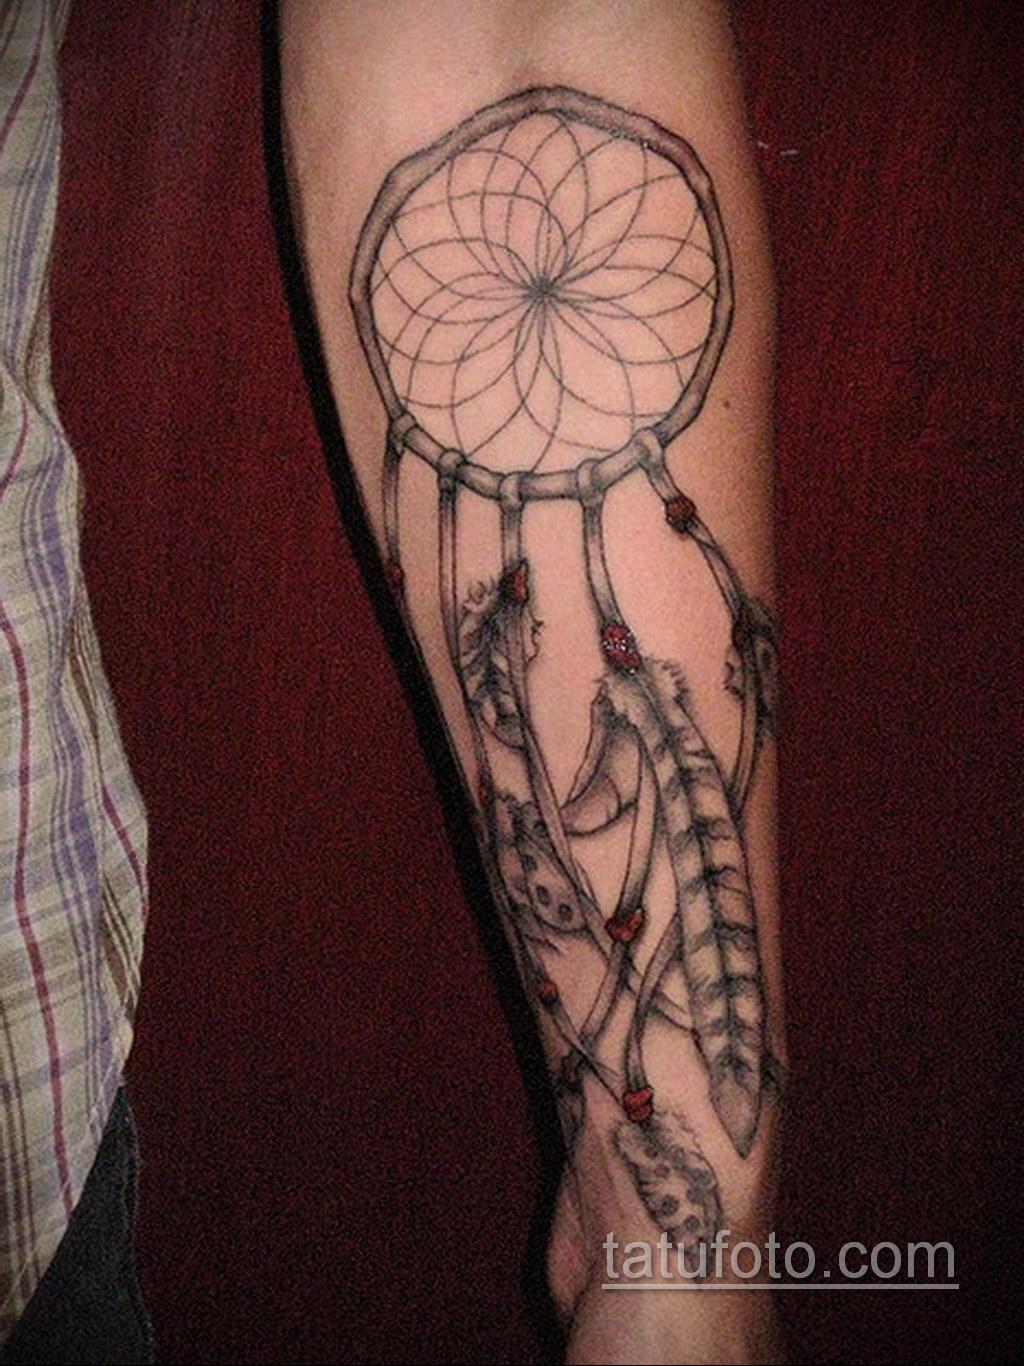 Фото рисунка тату с ловцом снов 22.11.2020 №128 -Dreamcatcher tattoo- tatufoto.com